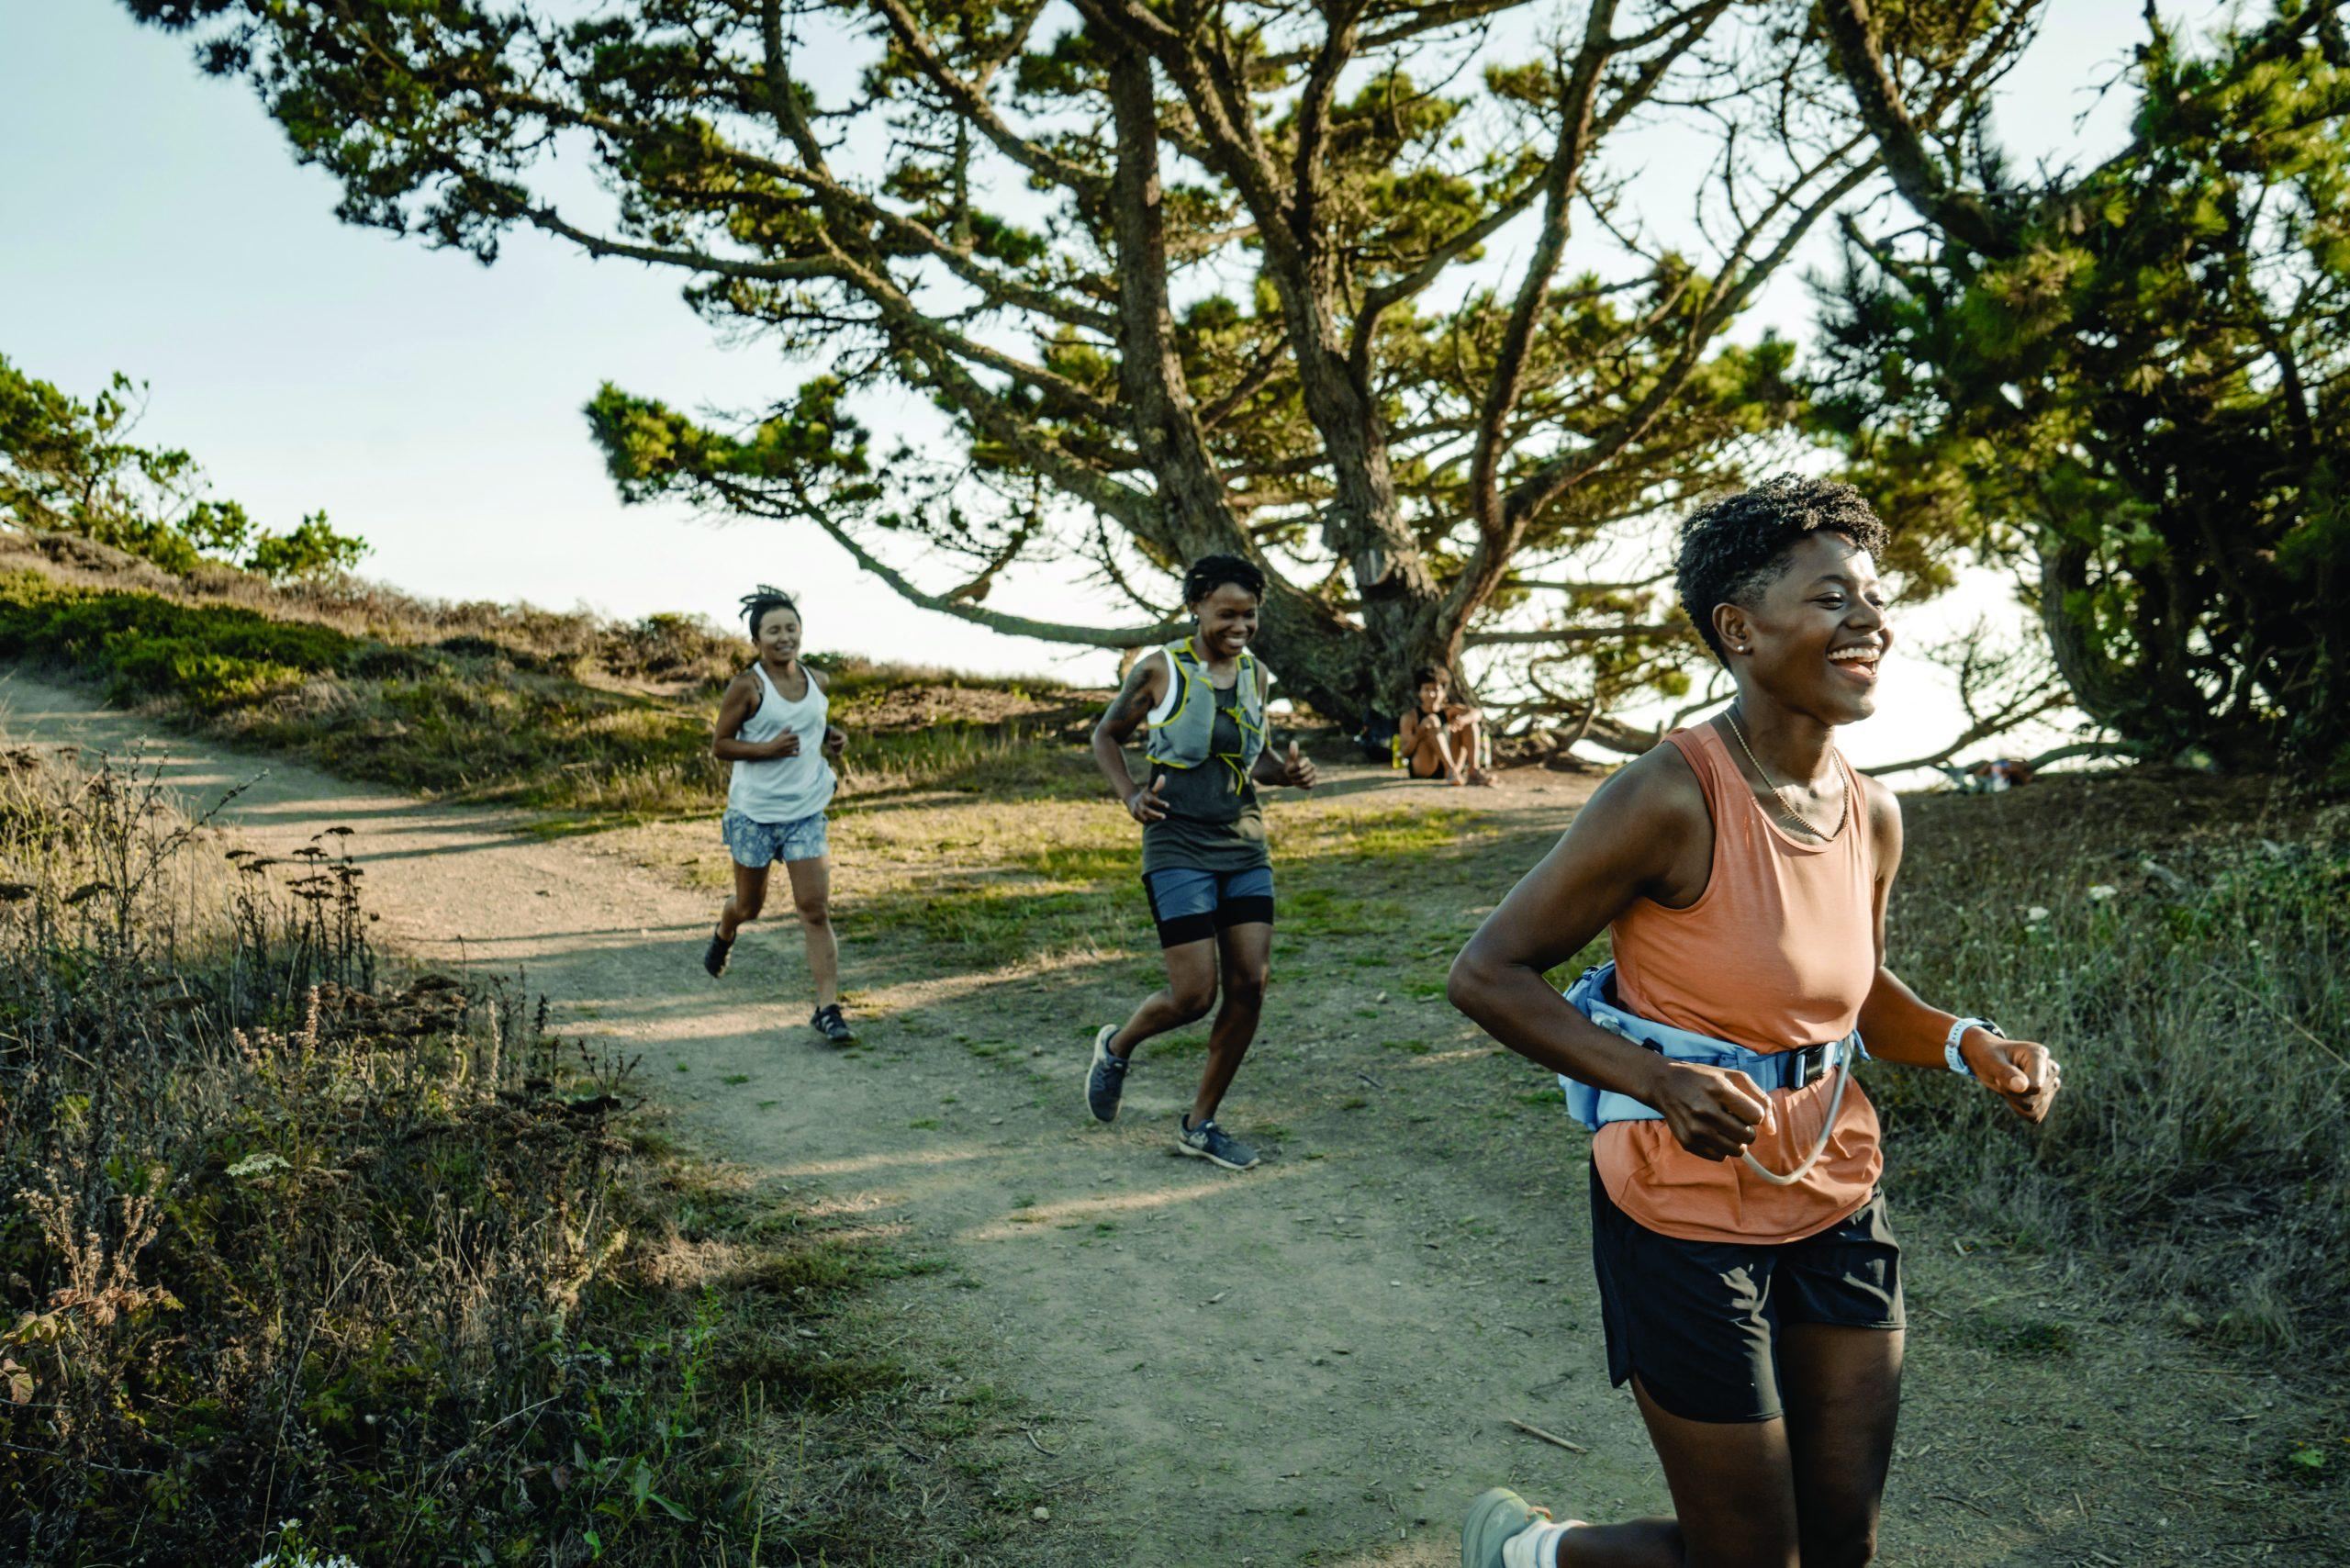 LBlount 20200907 OaklandTrailCrew 40 1 scaled Juntos corremos | Revista Trail Runner